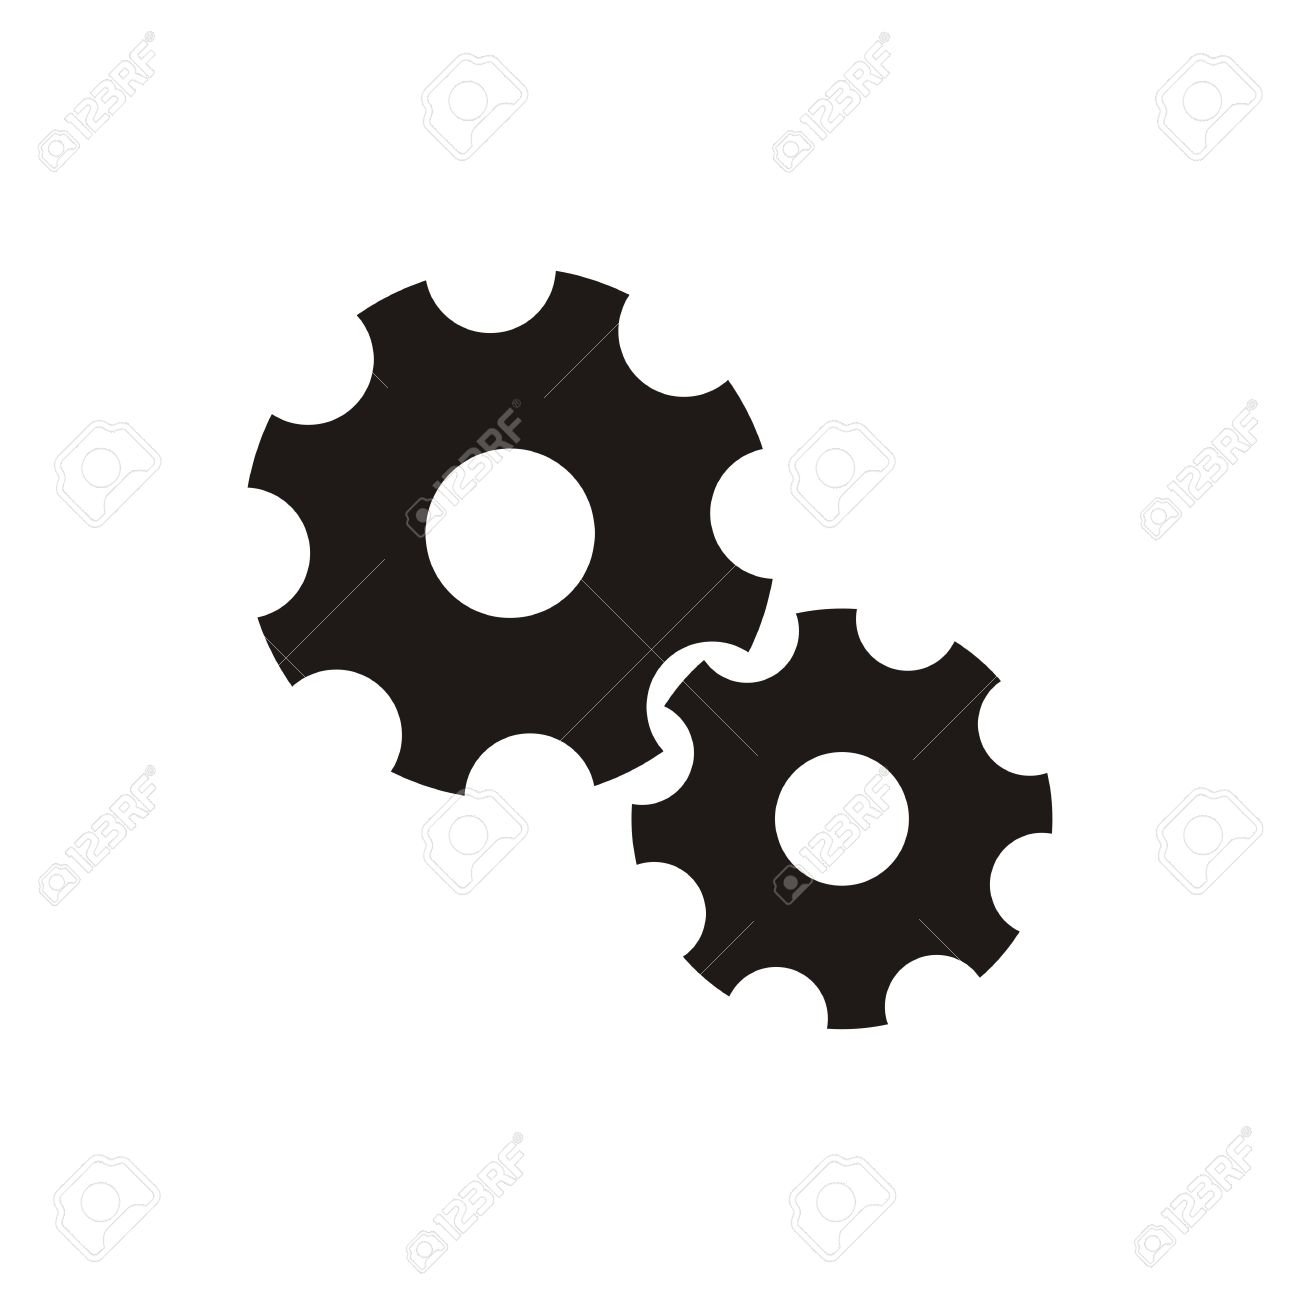 simple black gear wheels icon isolated royalty free cliparts rh 123rf com settings gear icon vector gear icon vector ai